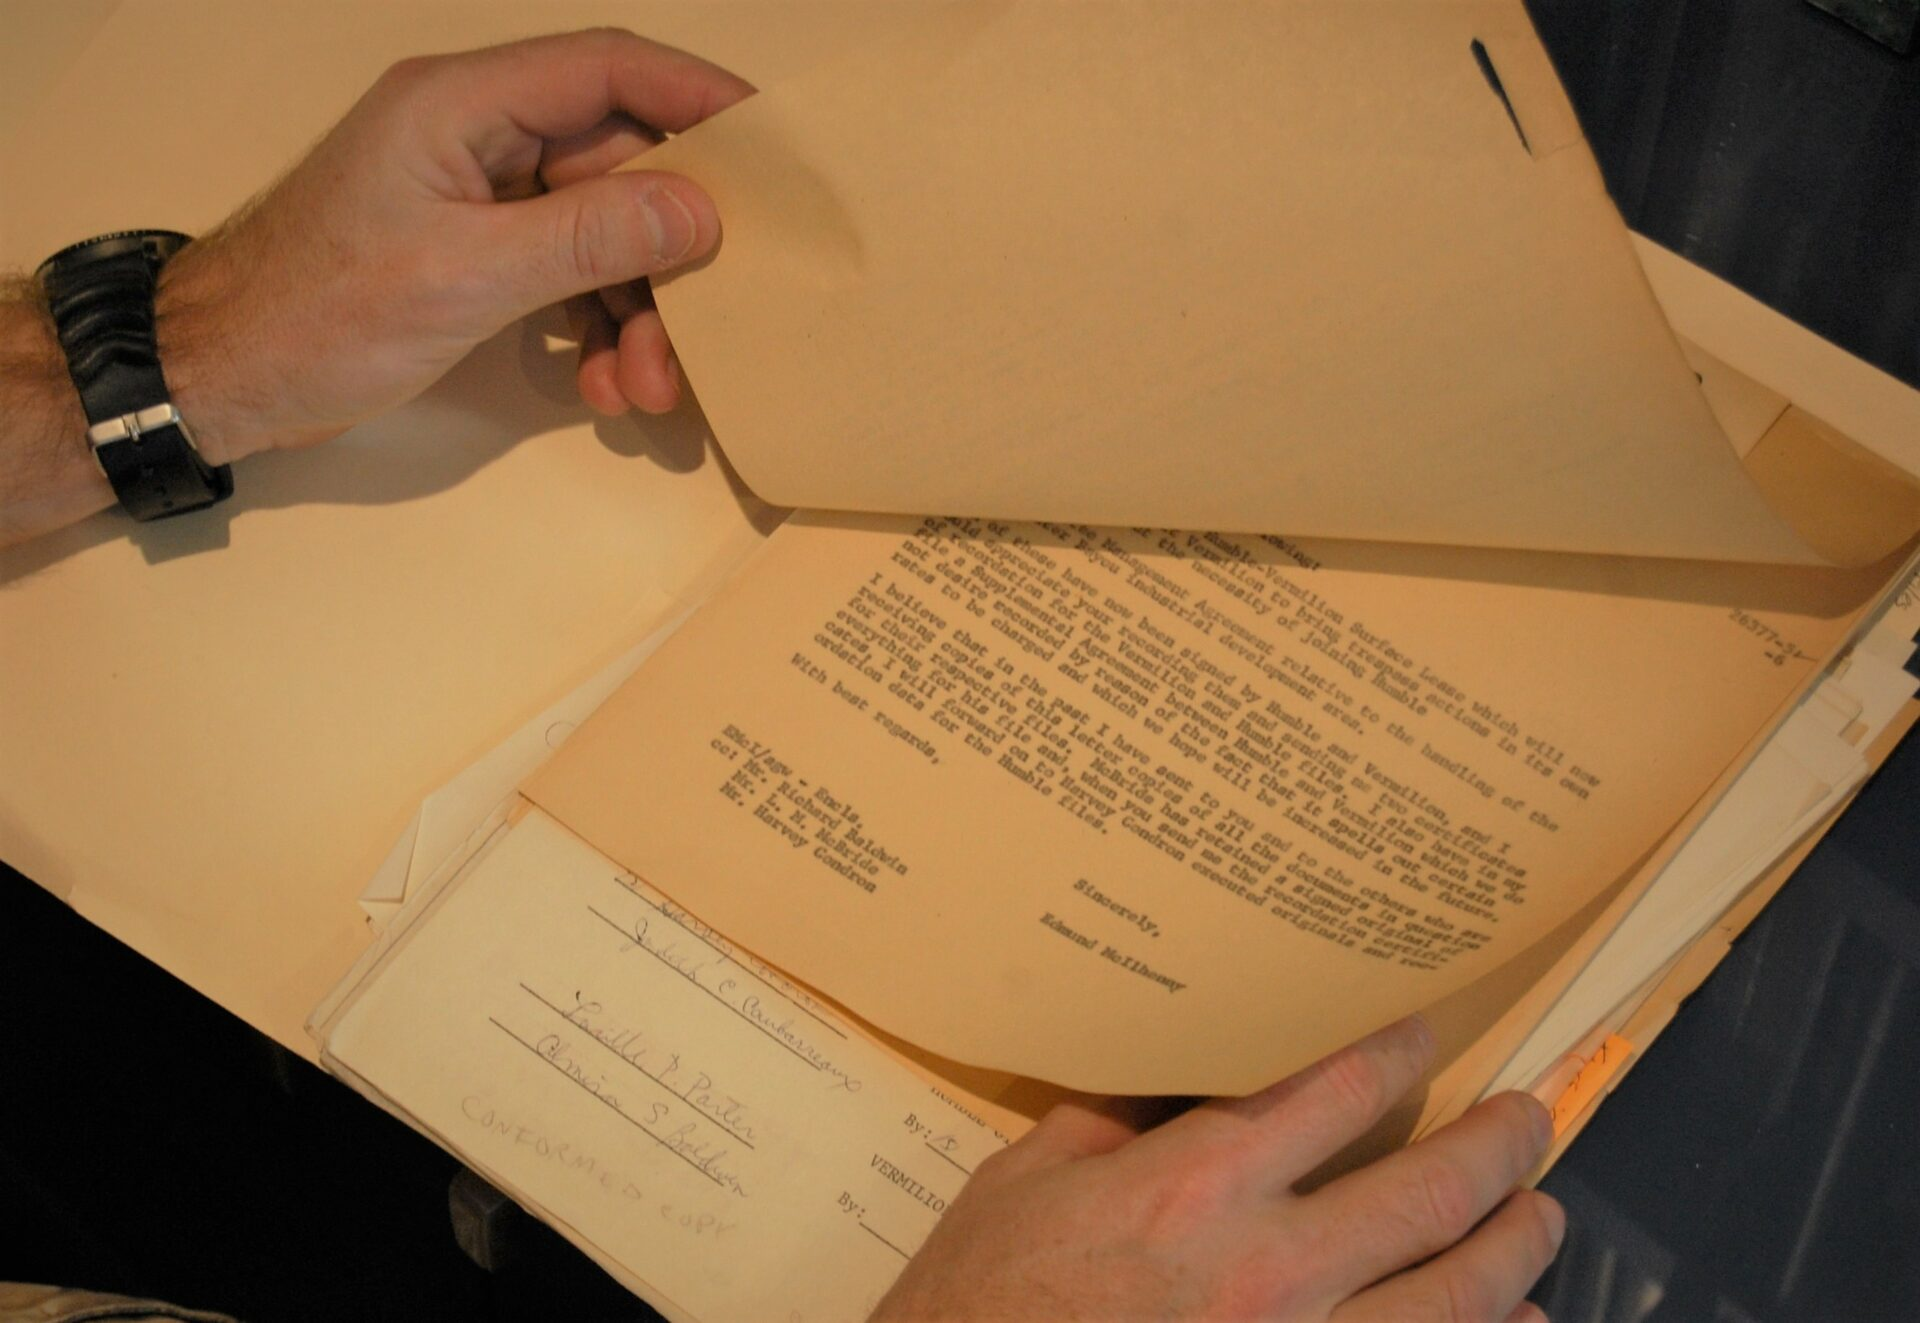 JT files close up